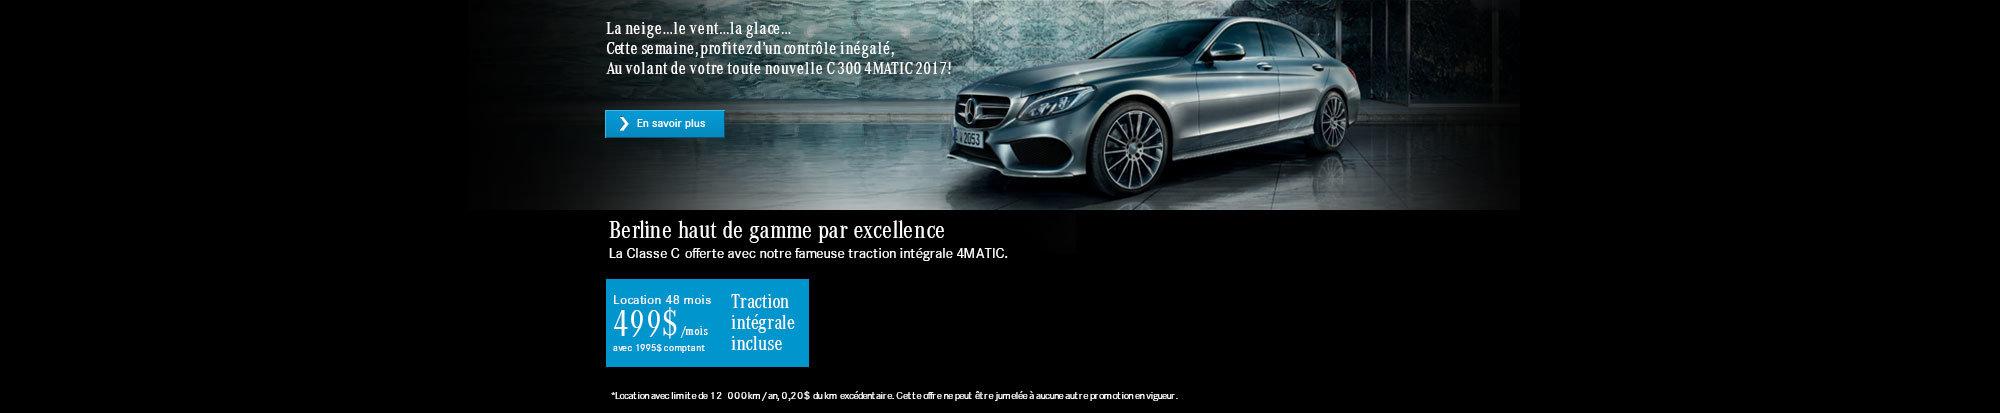 Mercedes-Benz Classe C 300 2017